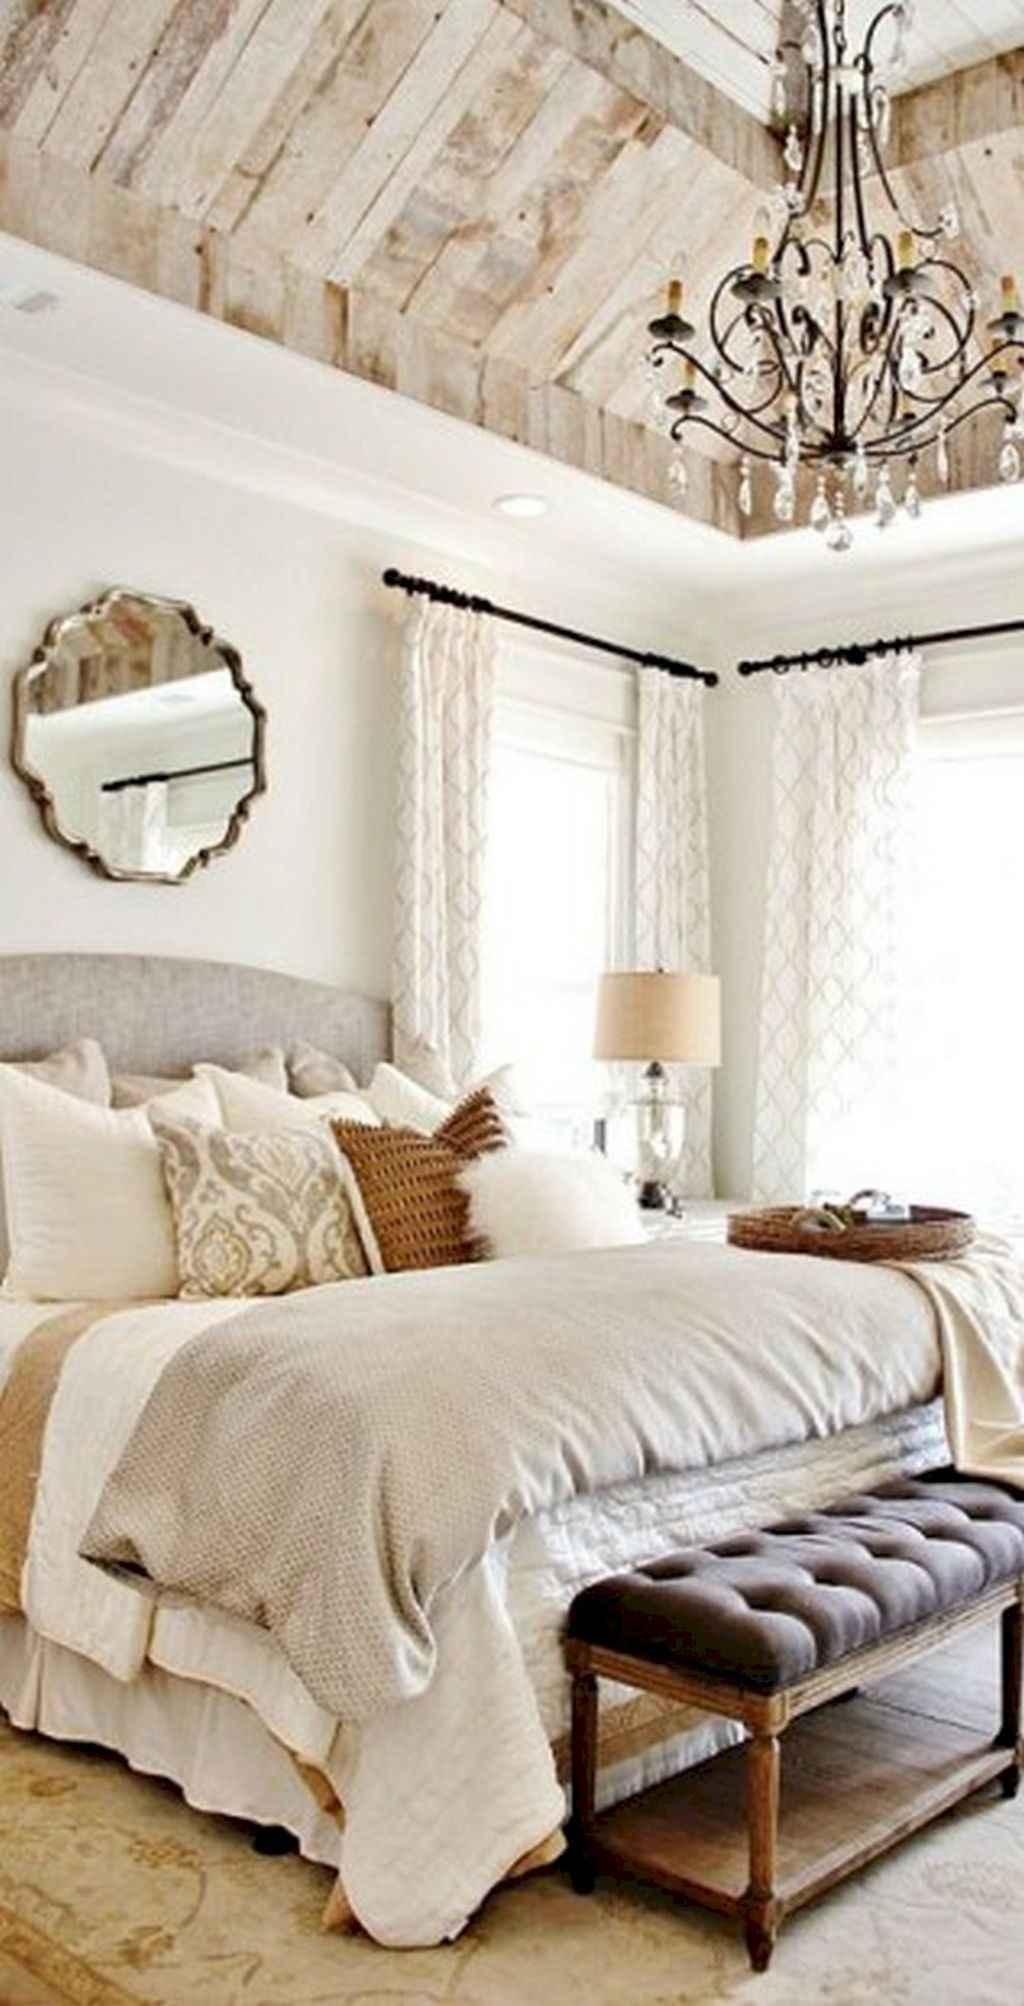 Incredible master bedroom ideas (23)